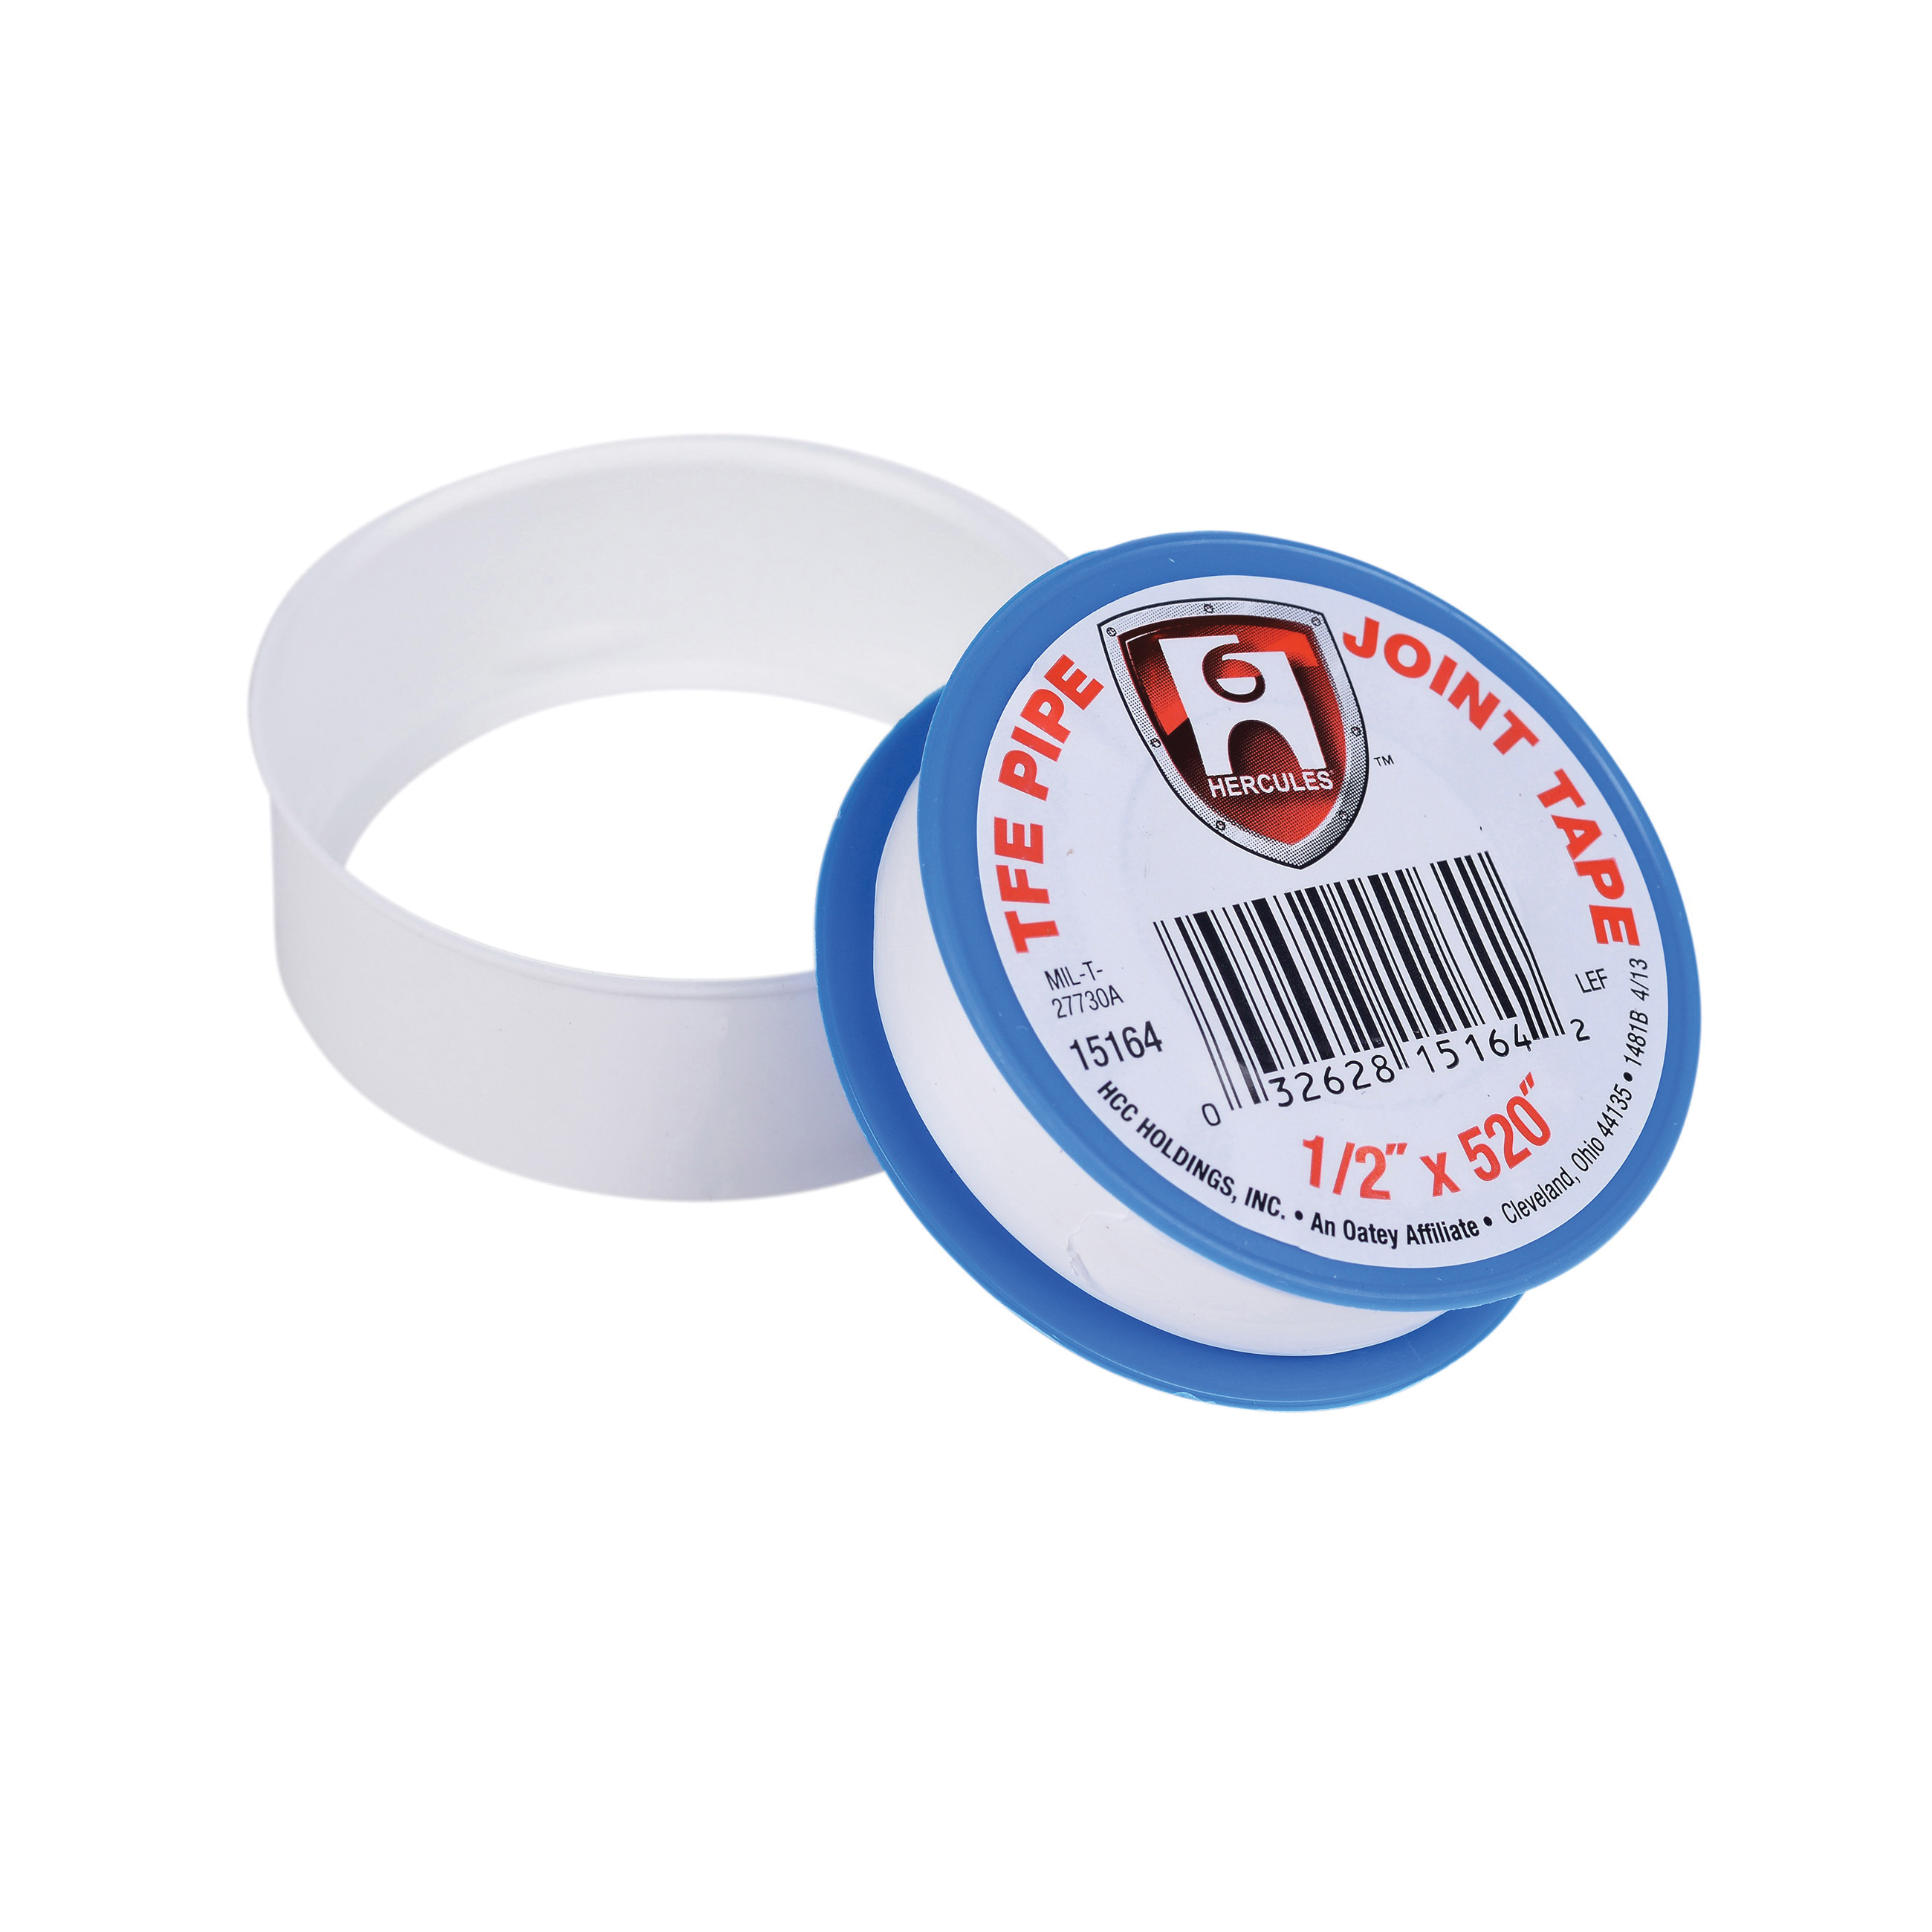 Hercules® 15164 Pipe Joint Tape, 1296 in L x 1/2 in W, PTFE